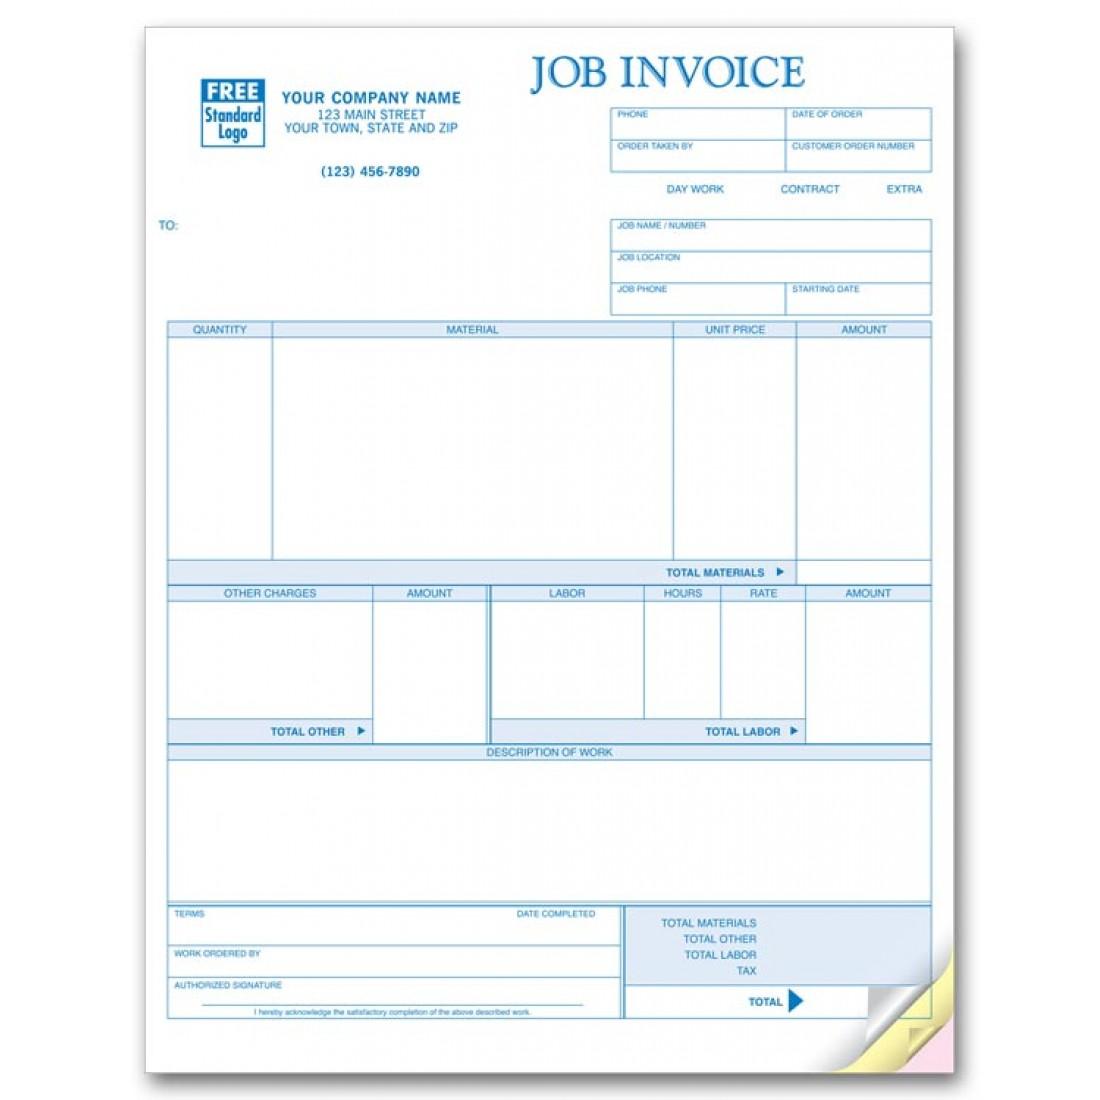 Laser Job Invoice